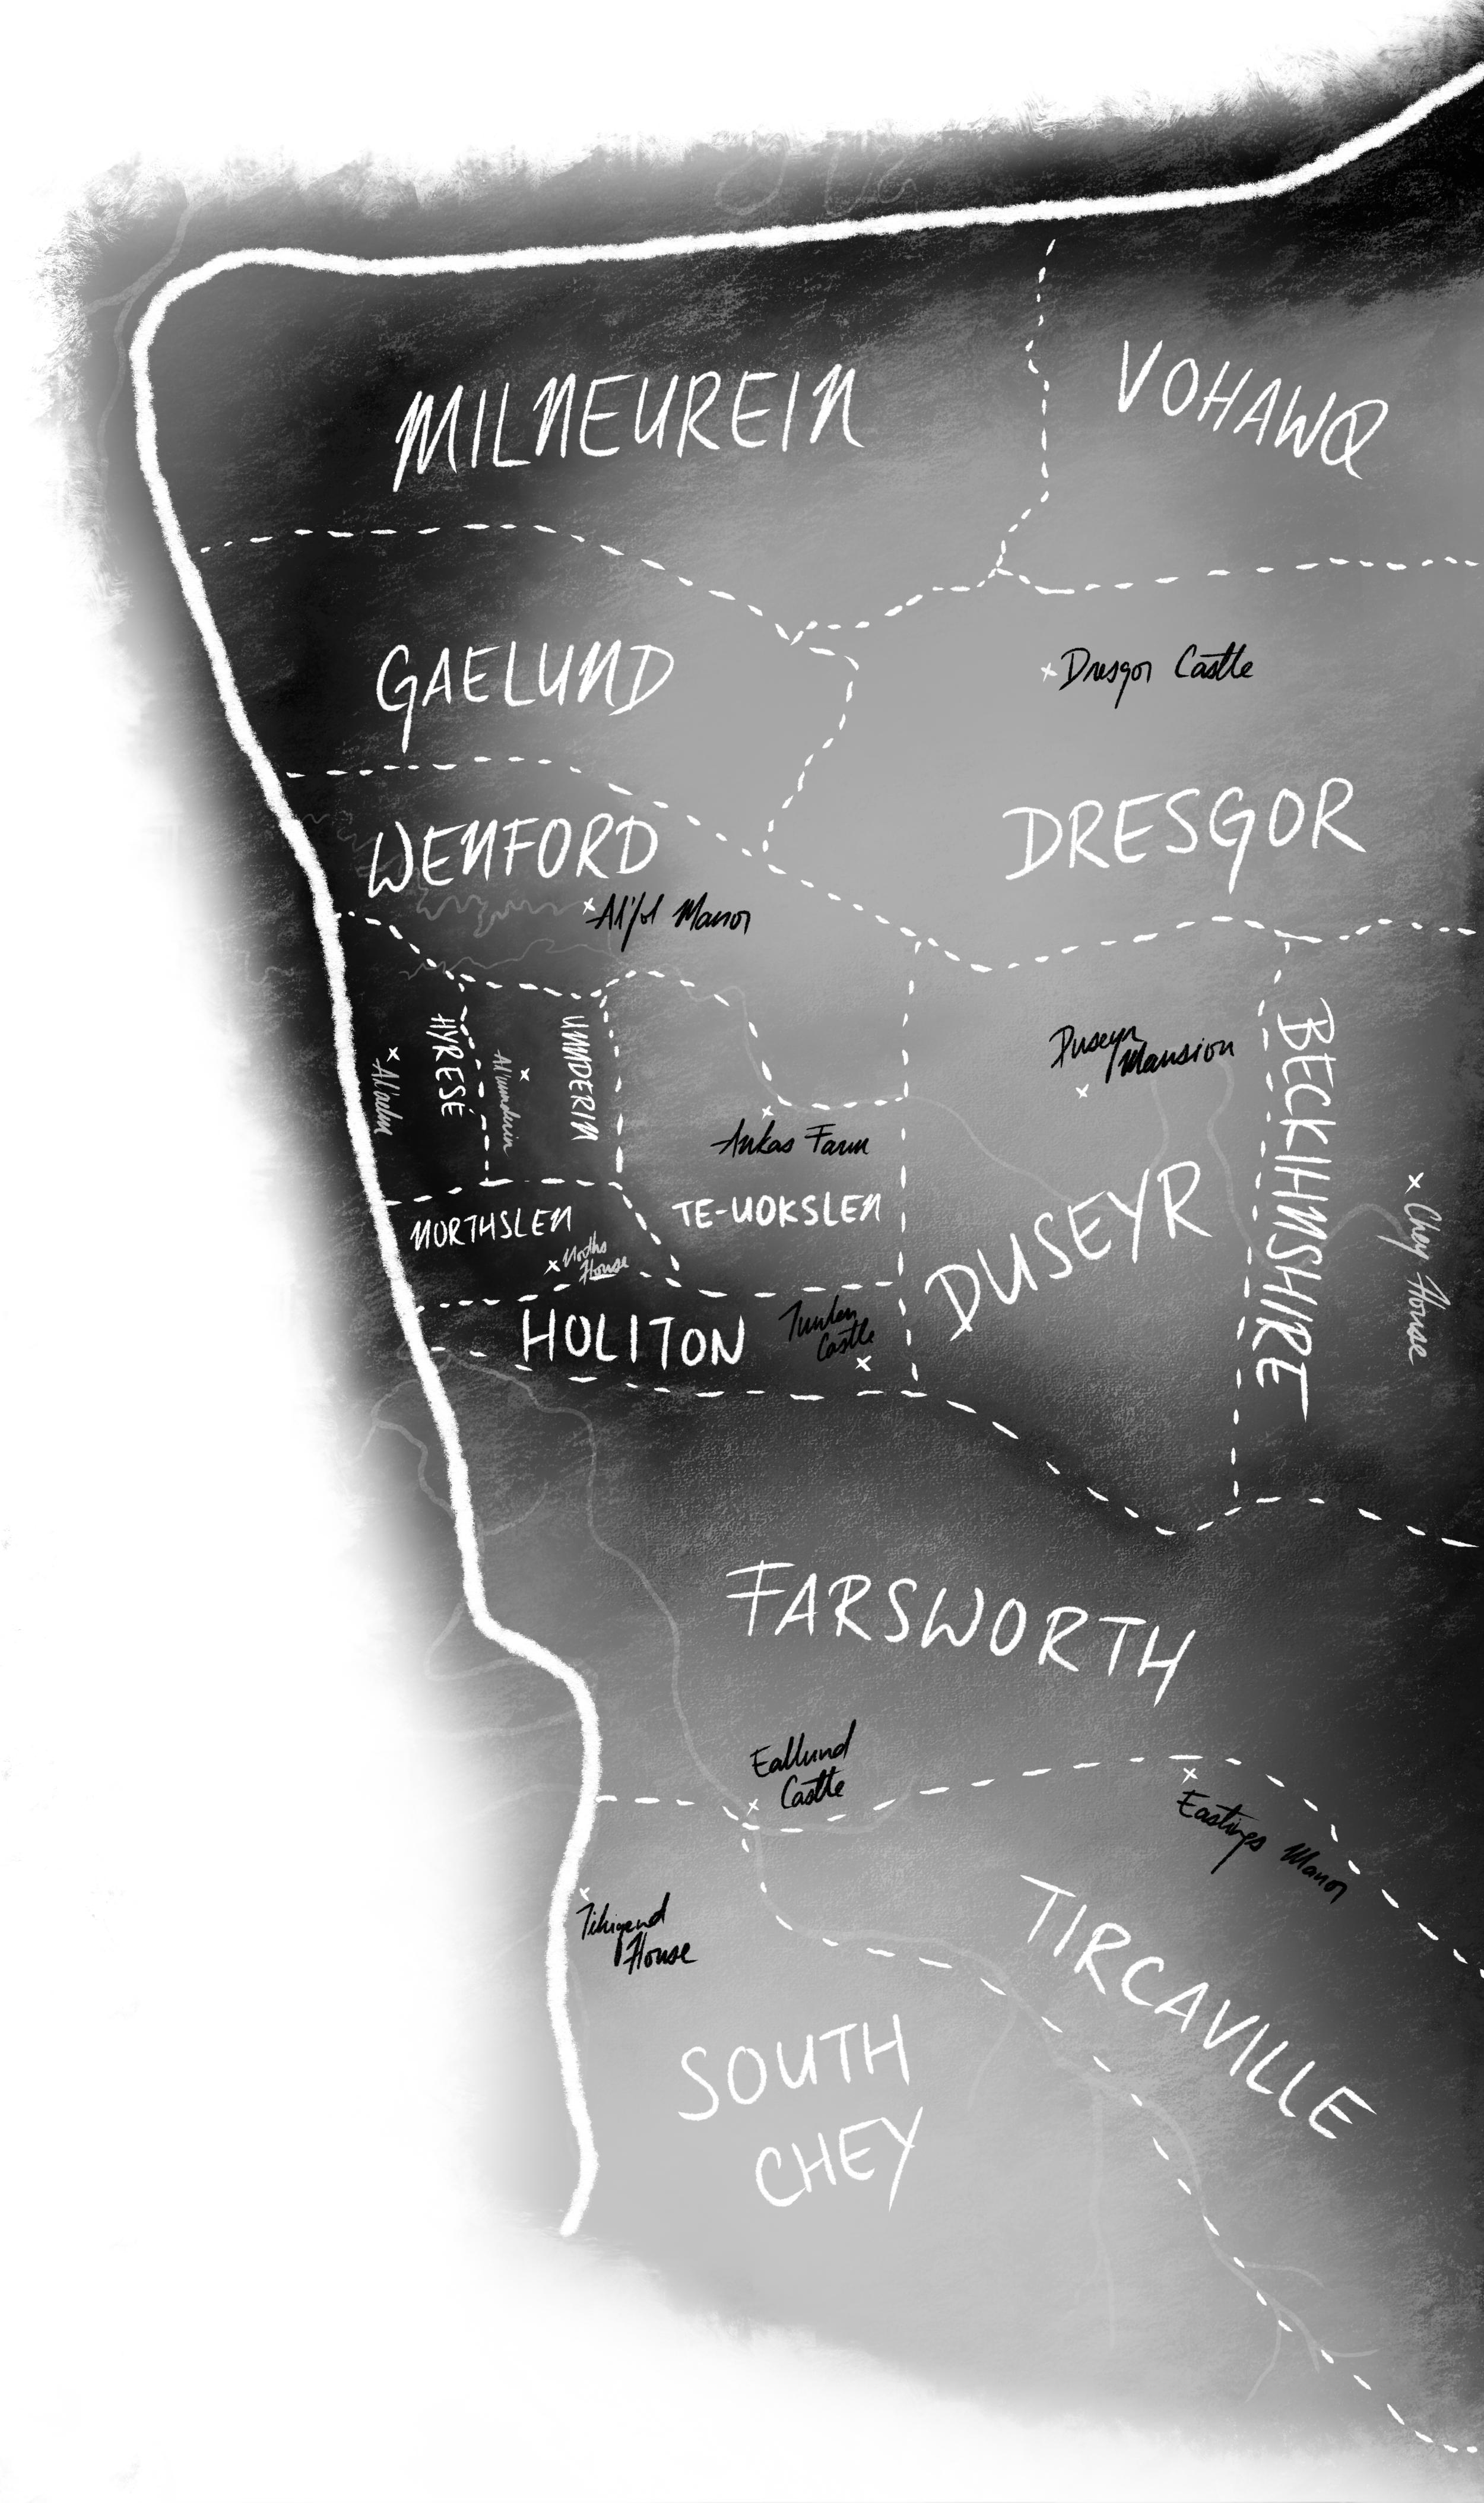 The Provinces of Al'esict Neradsof, 8042 (full map below)